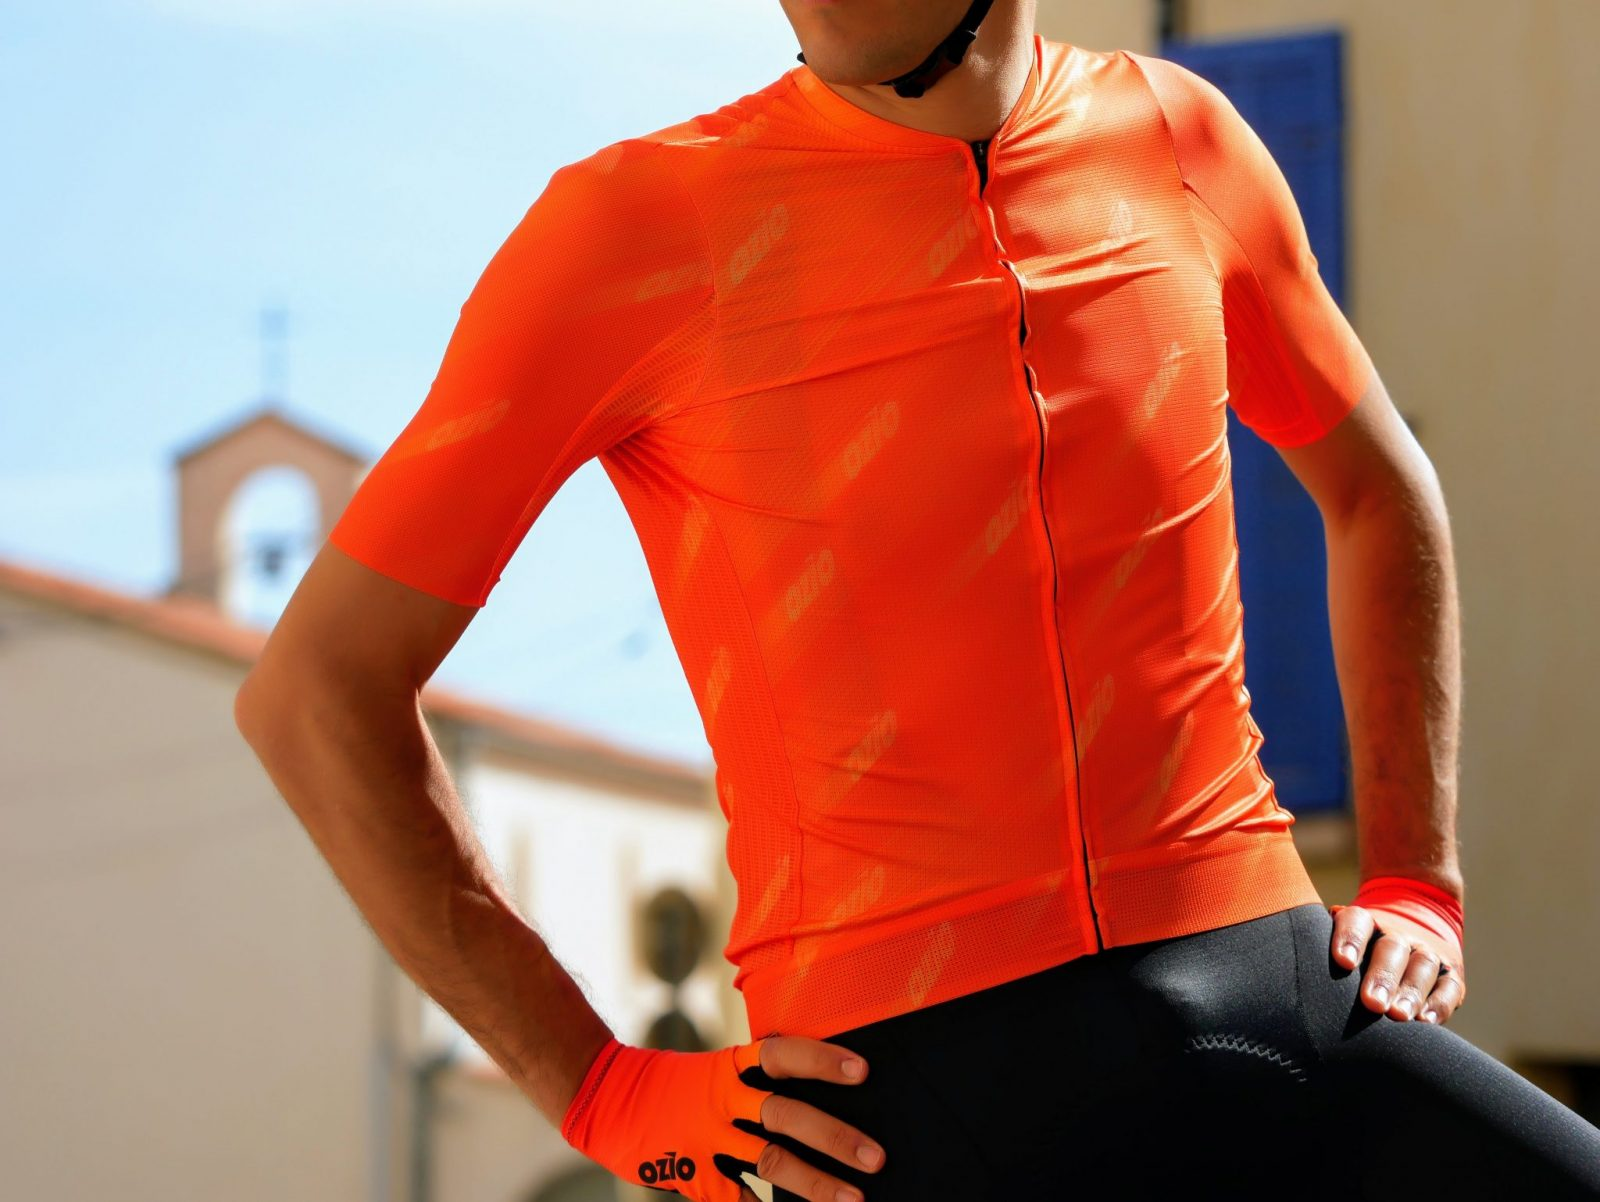 Maillot vélo léger orange ozio